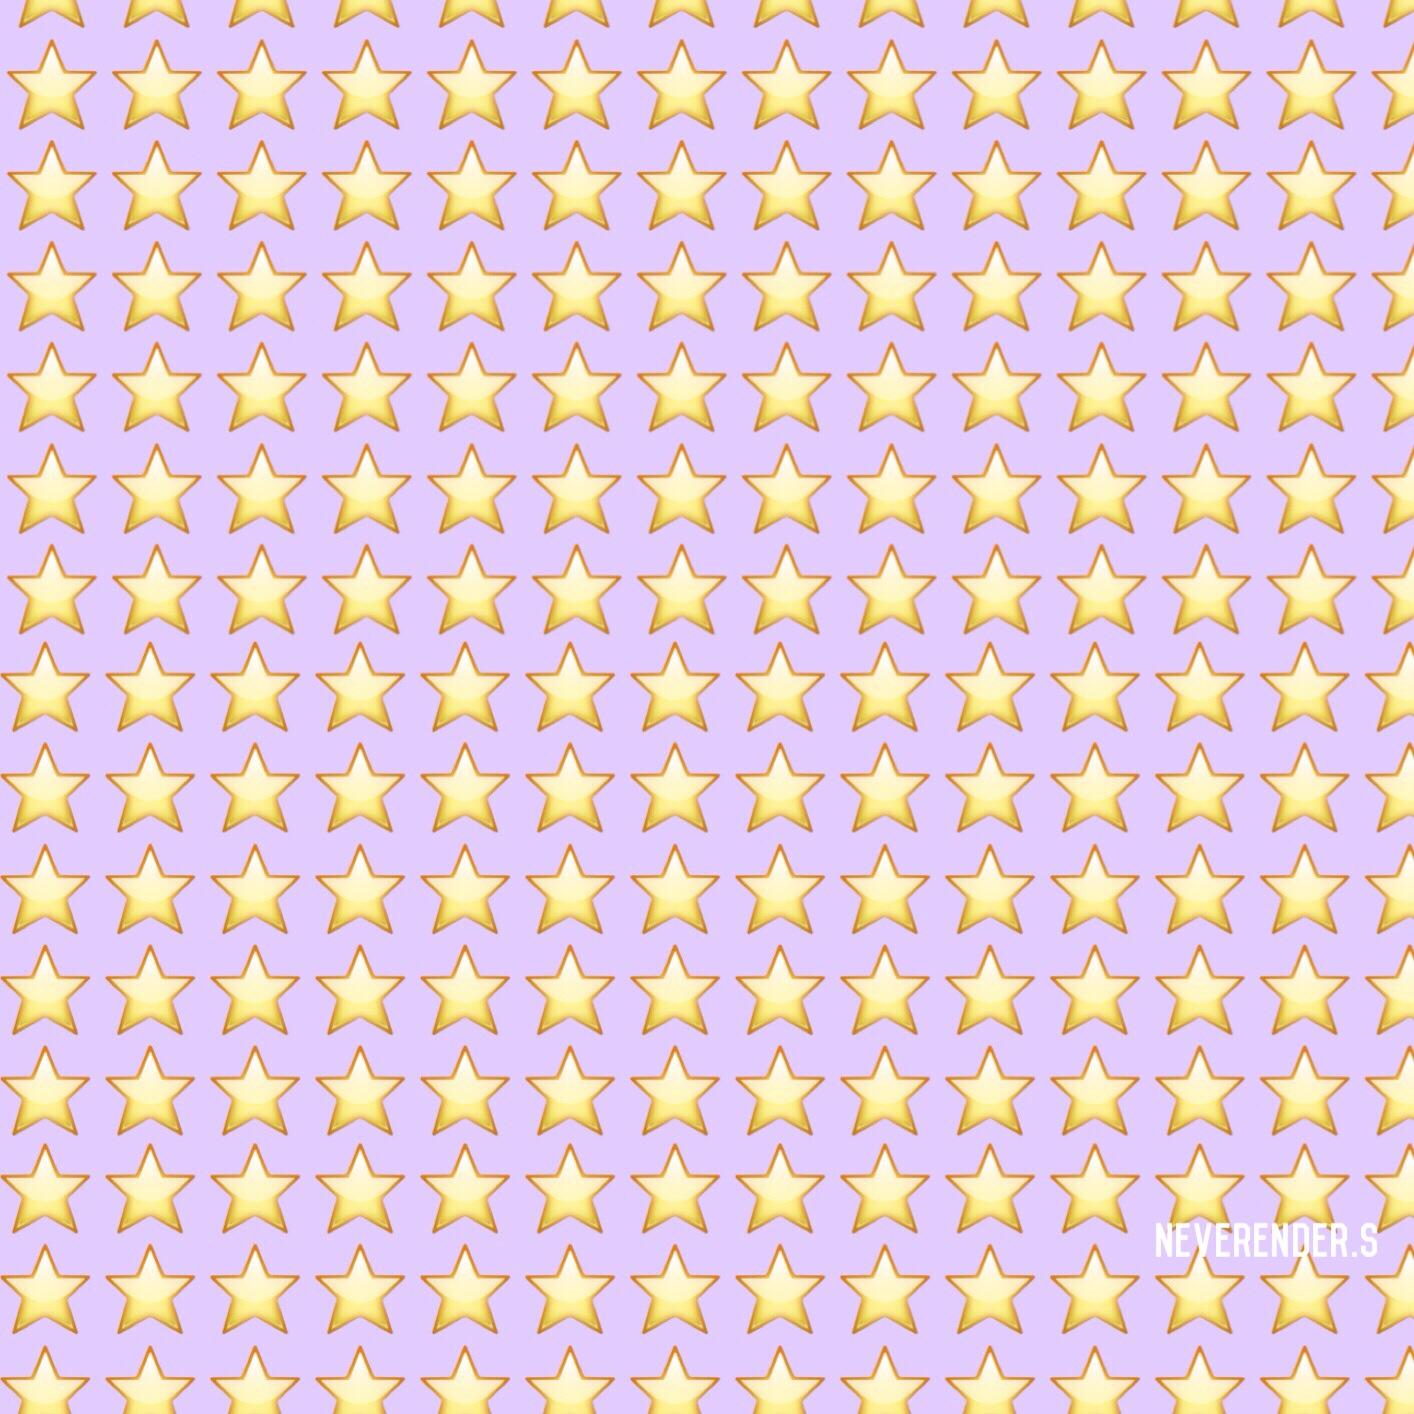 Hd Emoji Backgrounds   HD Photos Gallery 1414x1414